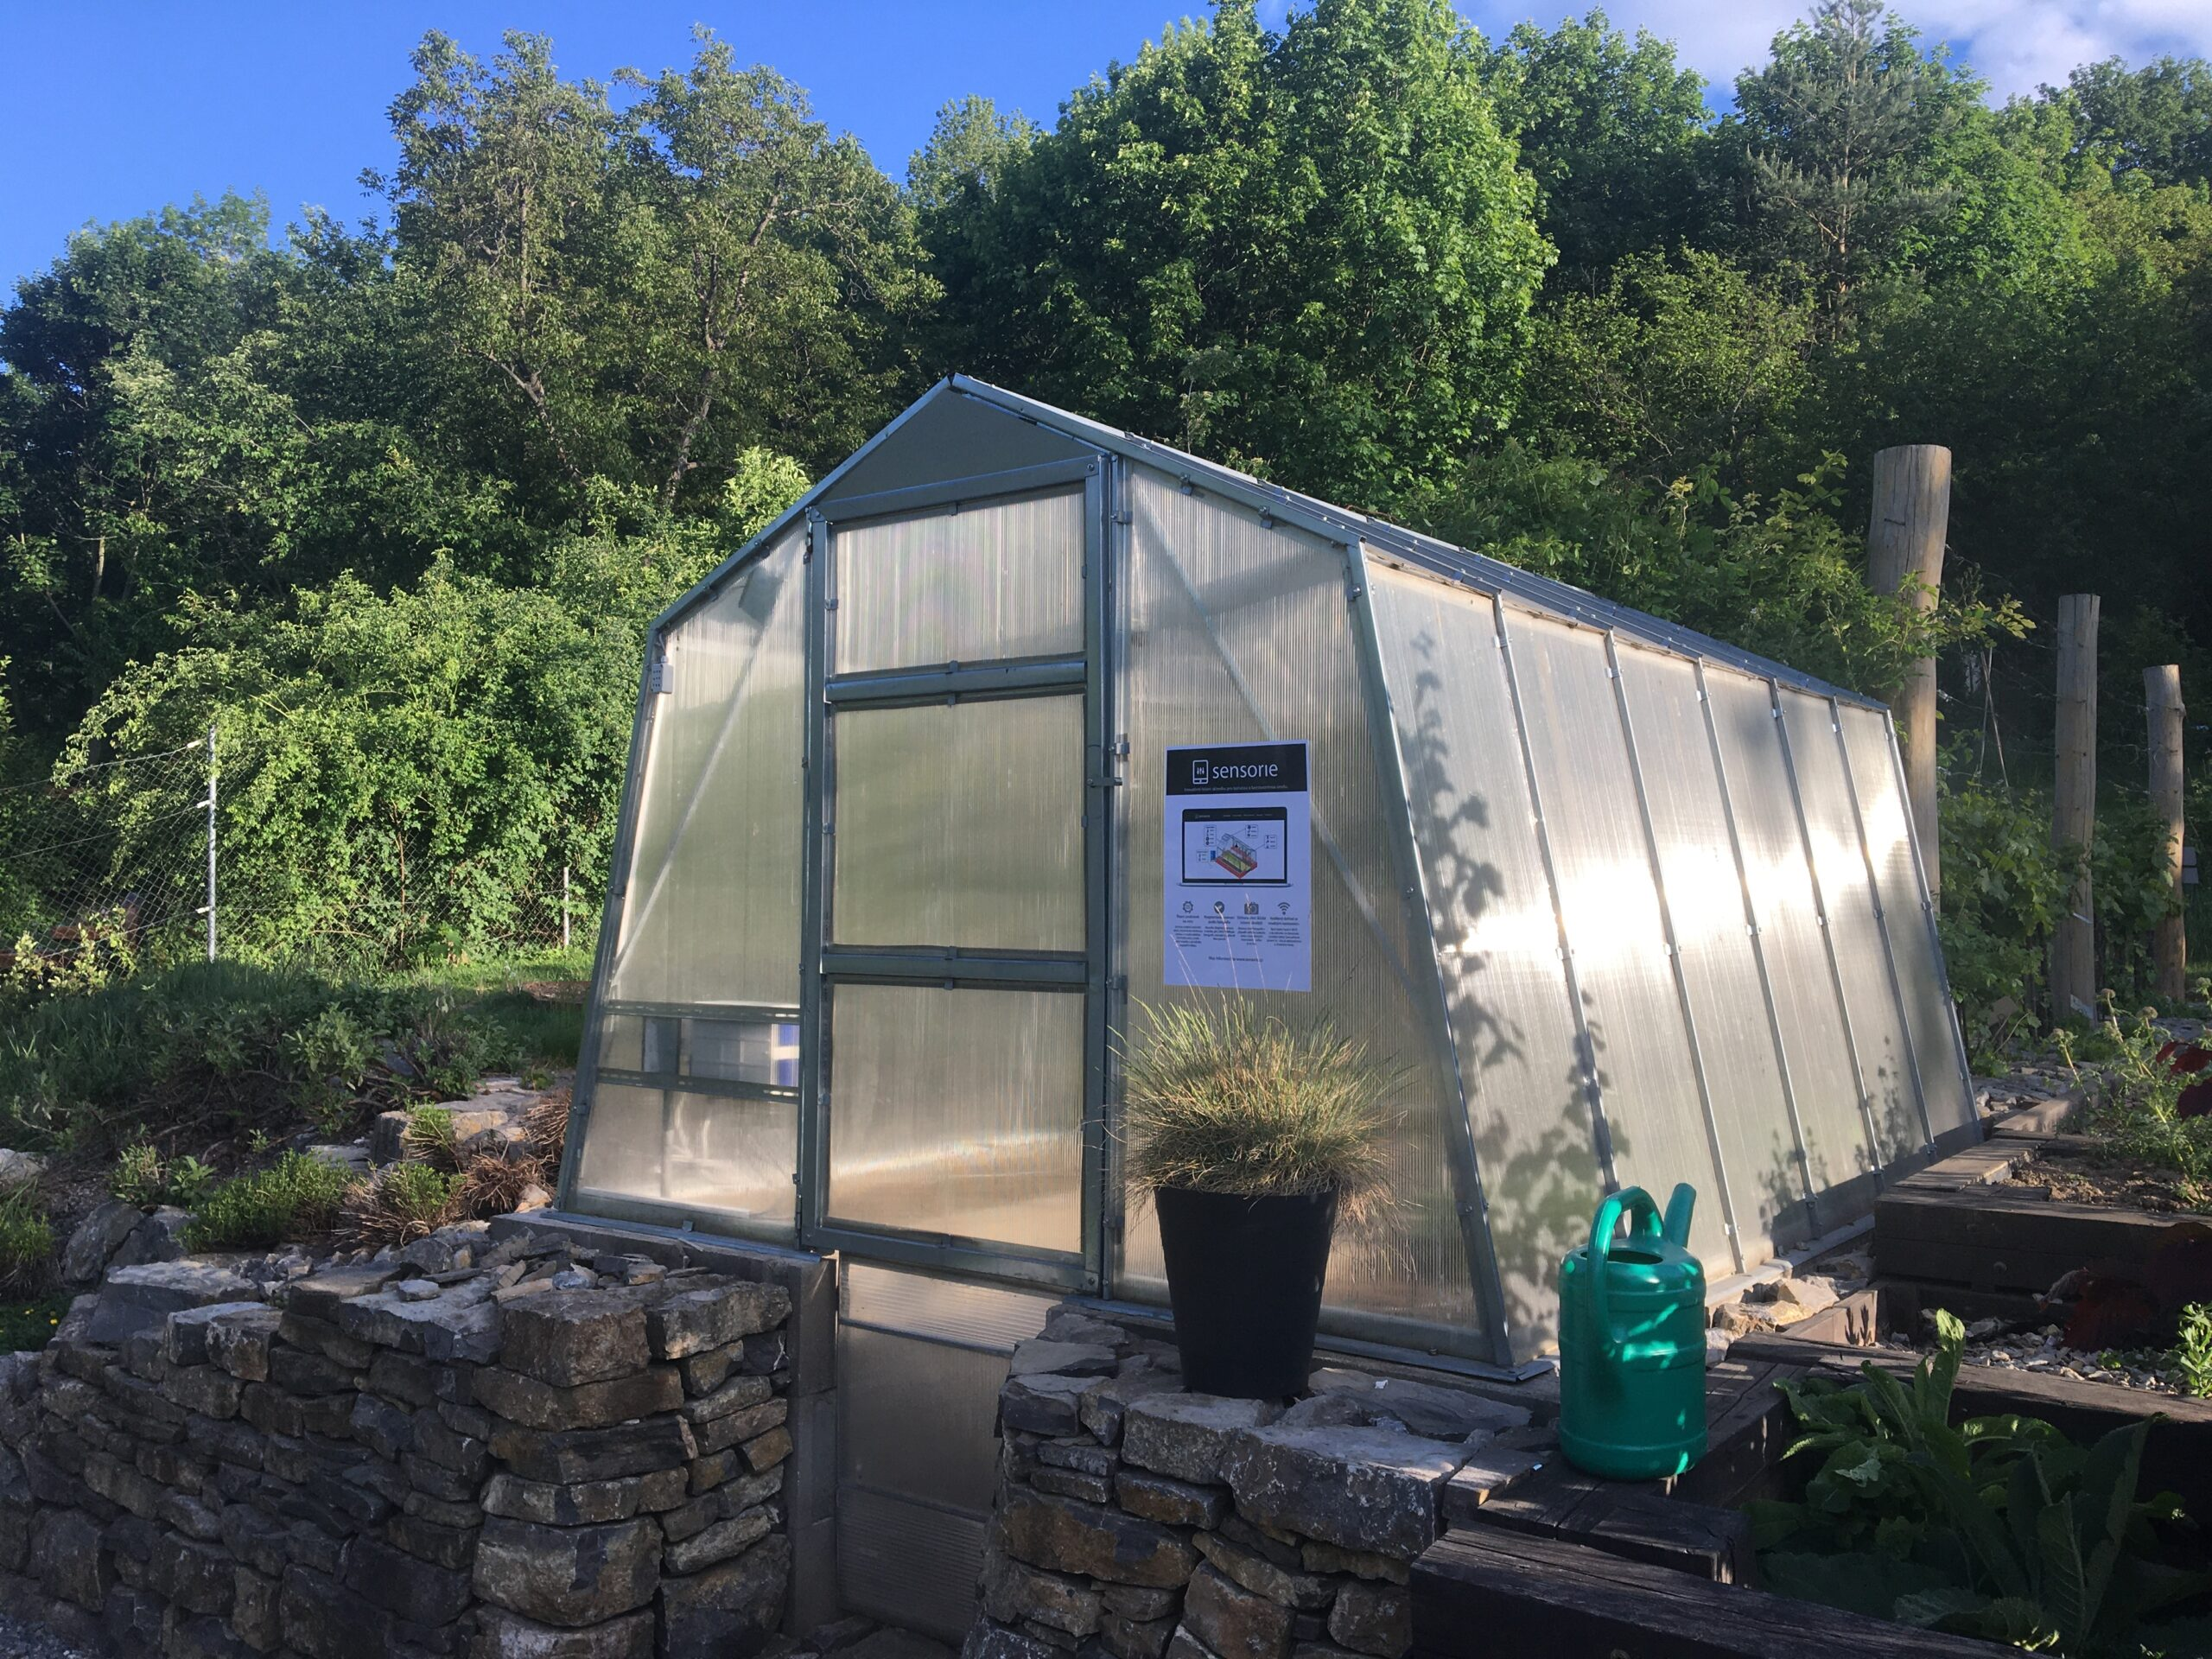 Navštivte Otevřenou zahradu